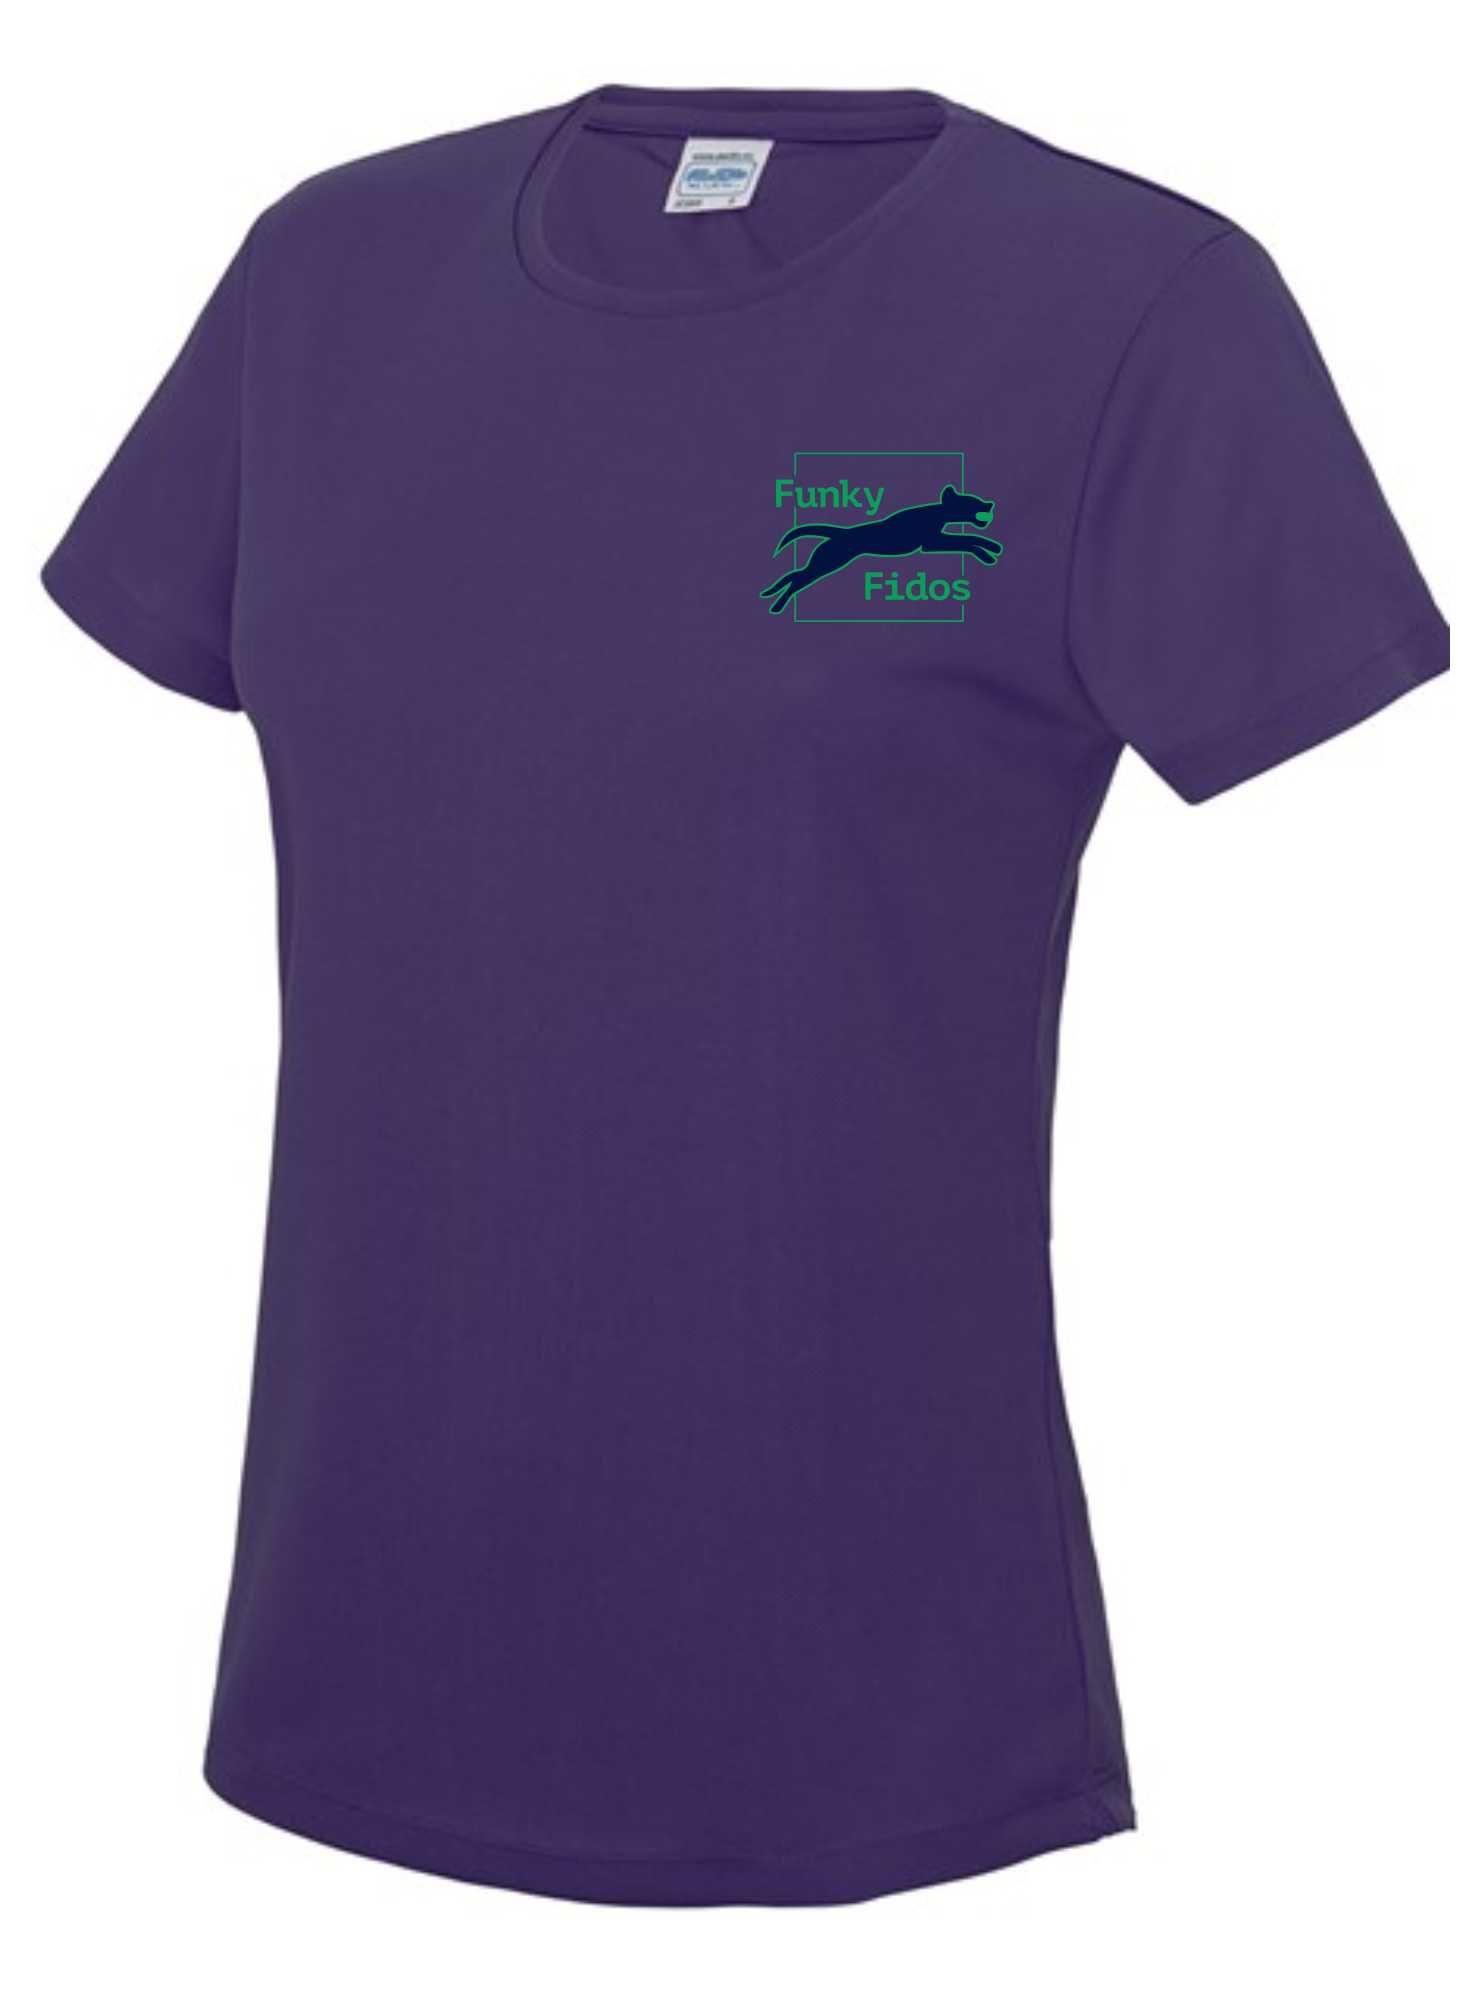 Funky Fidos – AWD Women's Cool Tee (Purple)